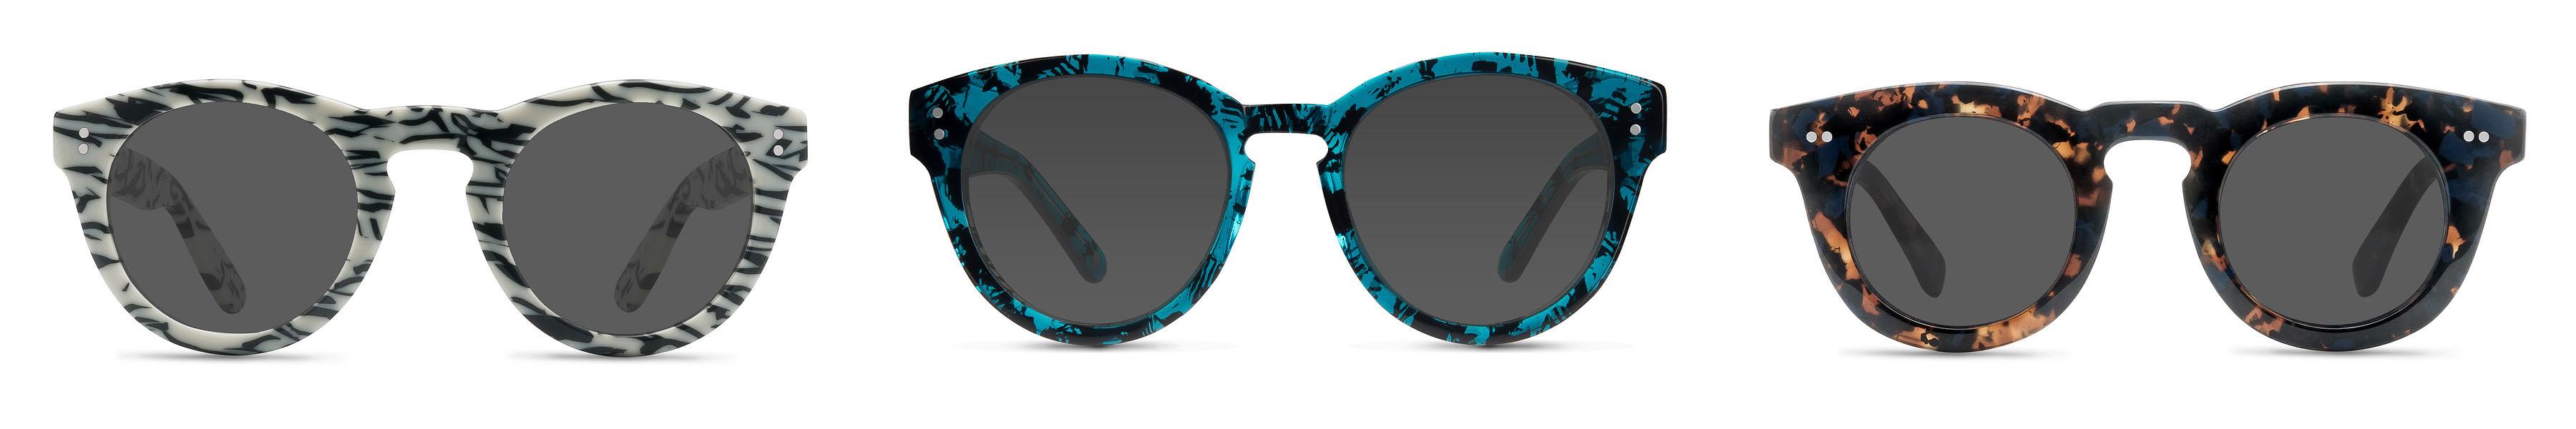 EyeBuyDirecy Eyewear Sunglasses H&M x Kenzo